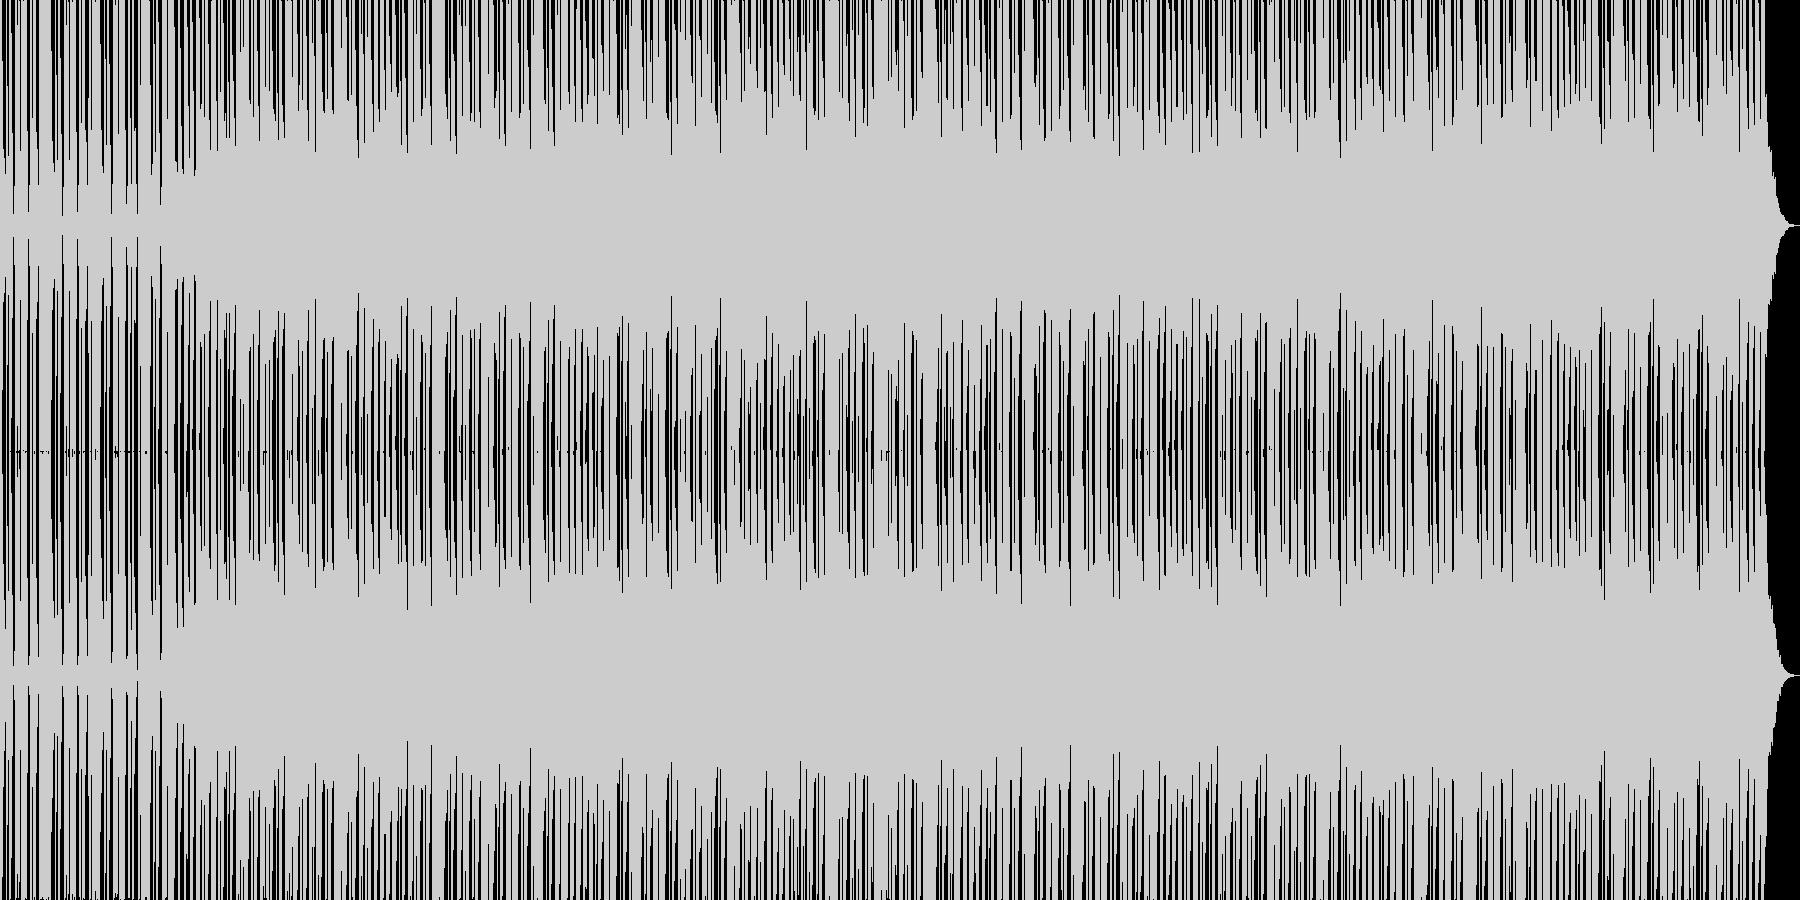 HIP HOP BEAT 1 の未再生の波形